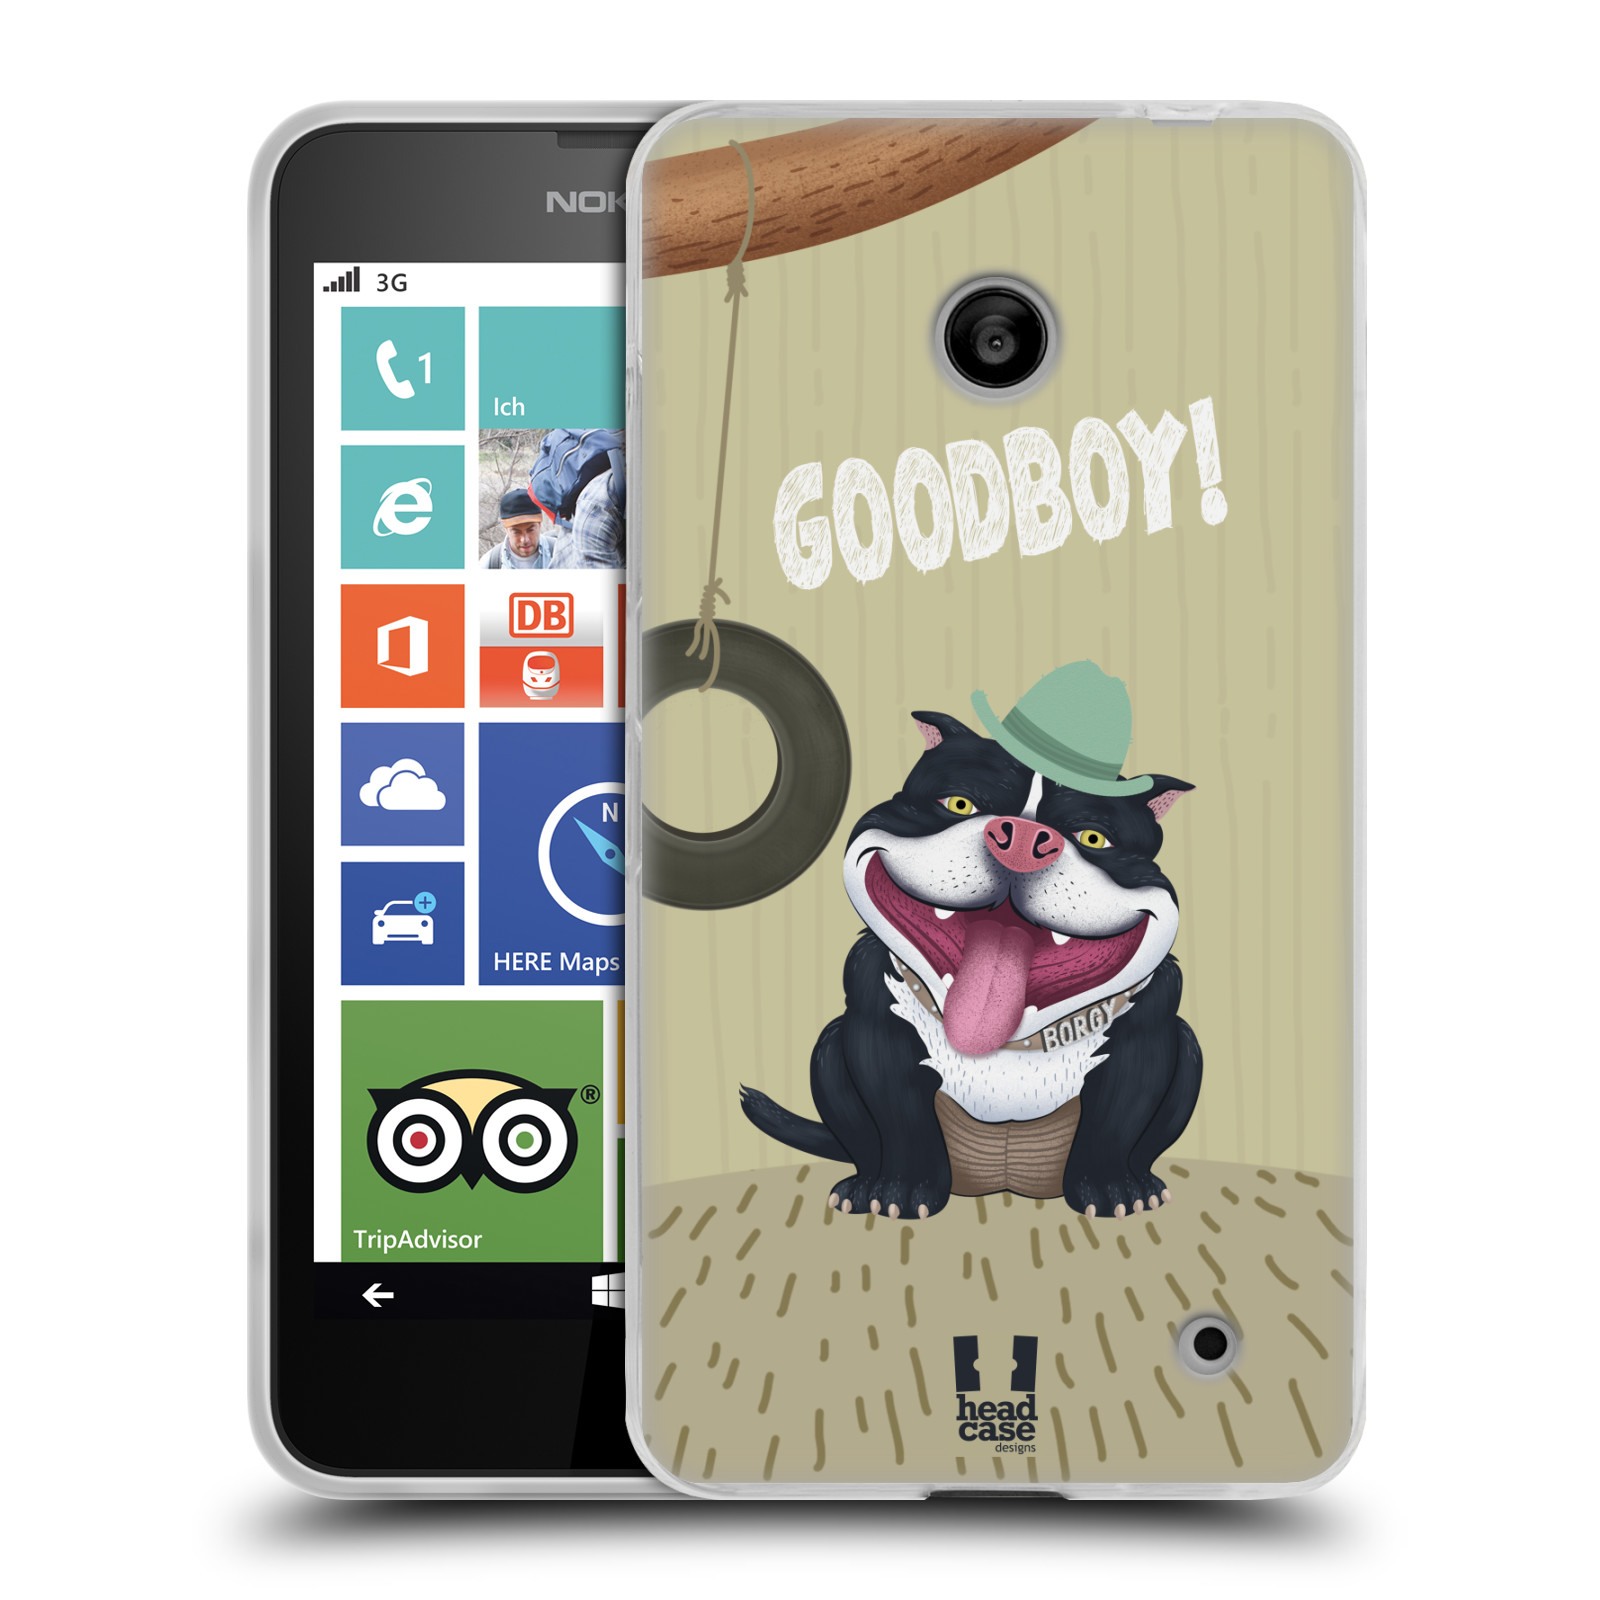 Silikonové pouzdro na mobil Nokia Lumia 635 HEAD CASE Goodboy! Pejsek (Silikonový kryt či obal na mobilní telefon Nokia Lumia 635 Dual SIM)